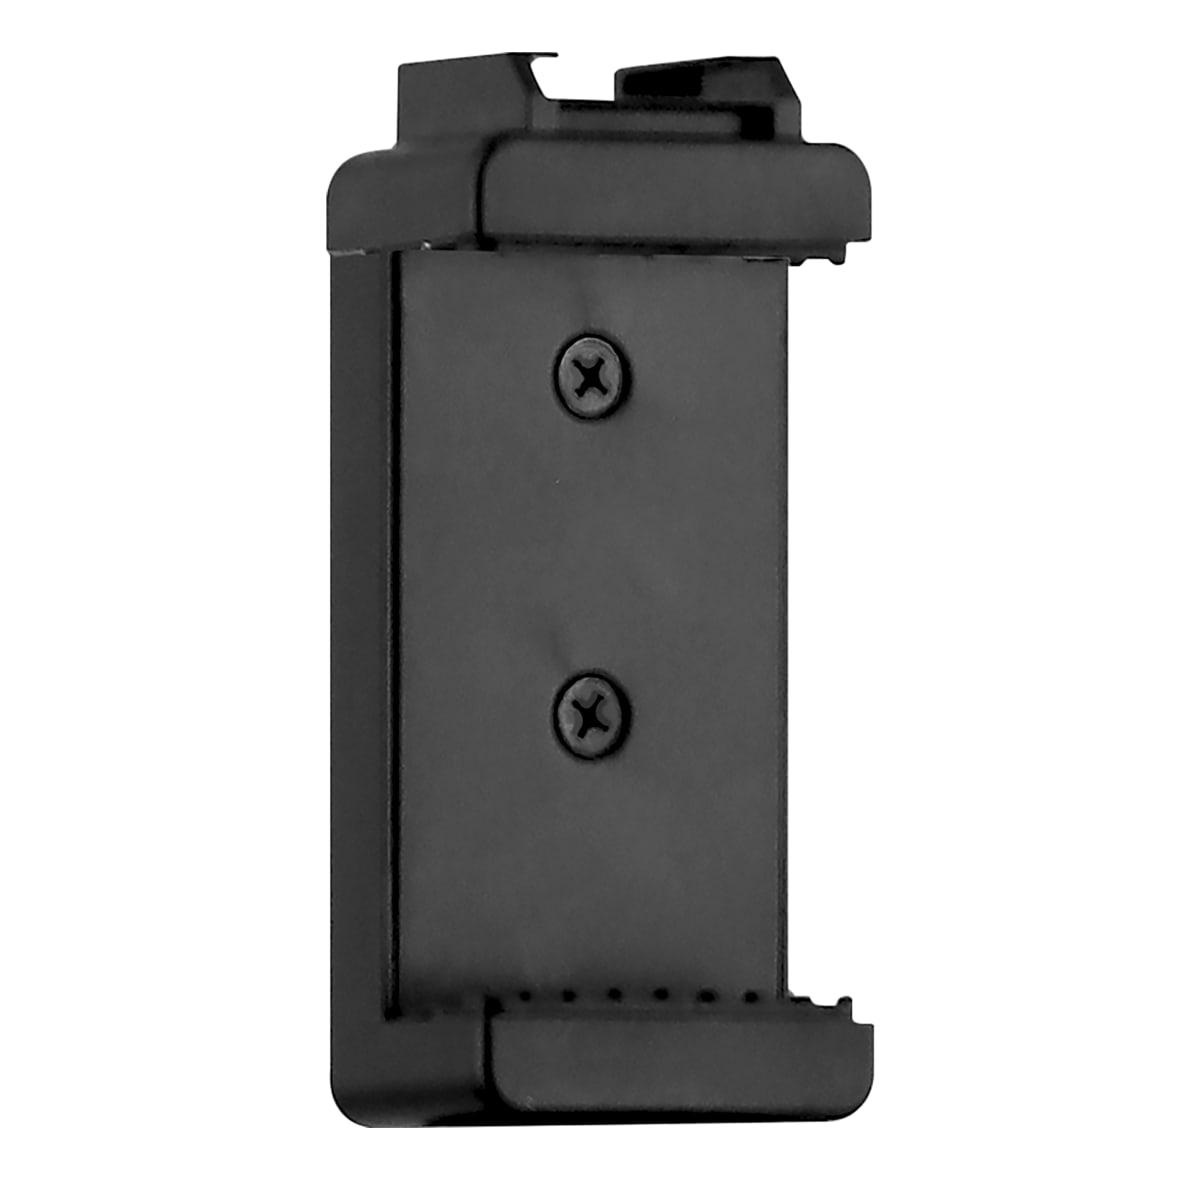 Tripod smartphone holder